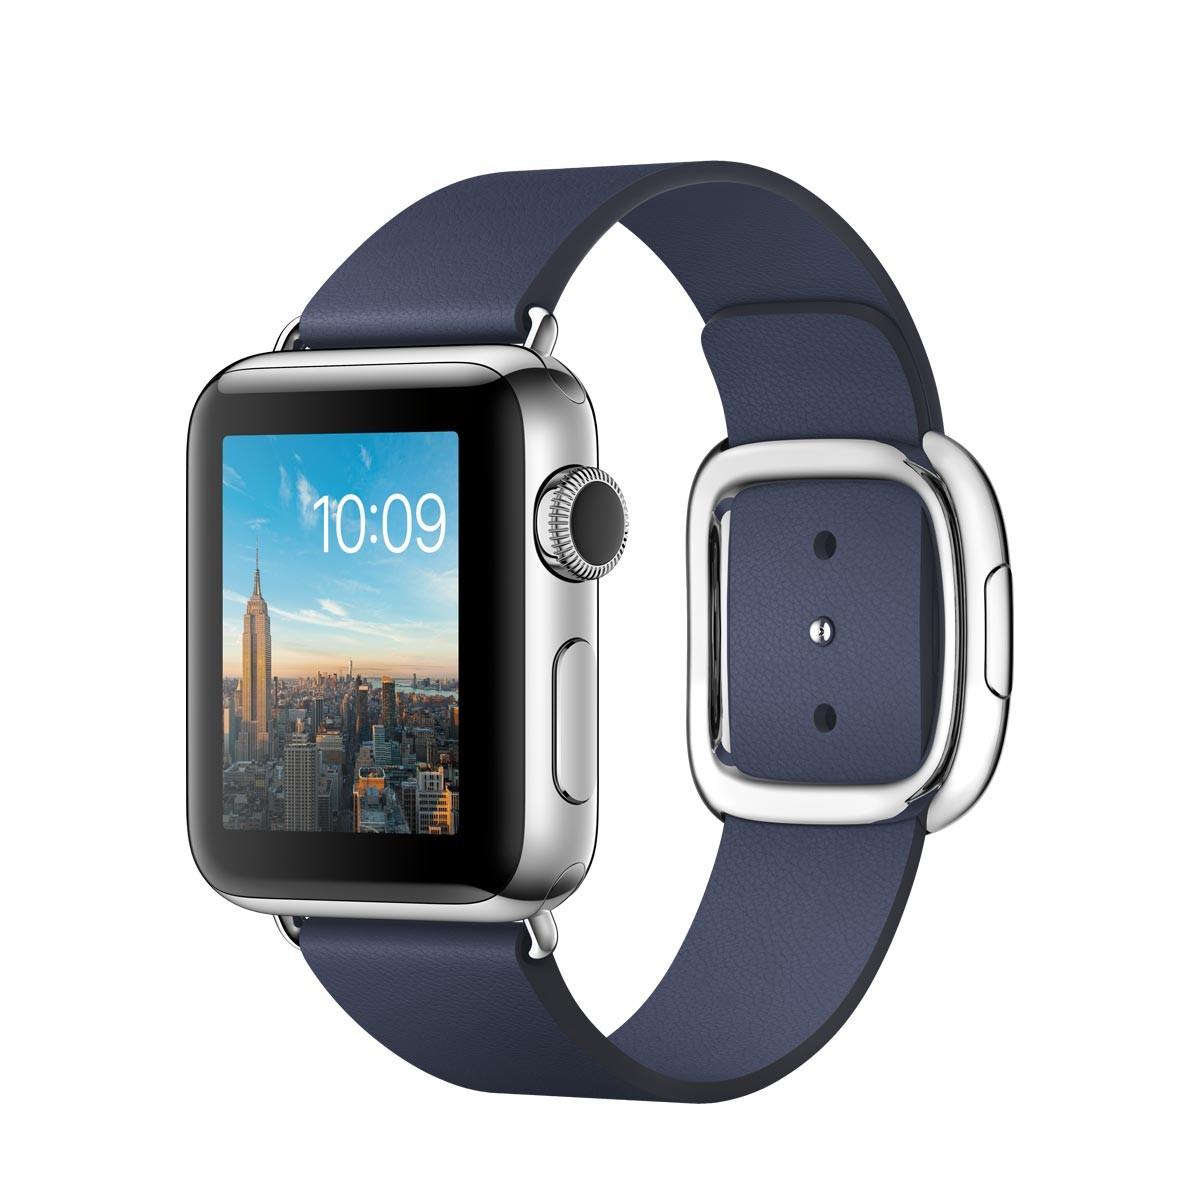 Apple Watch Series 2 - 38mm Stainless Steel Case s Midnight Blue Modern Buckle - (M)